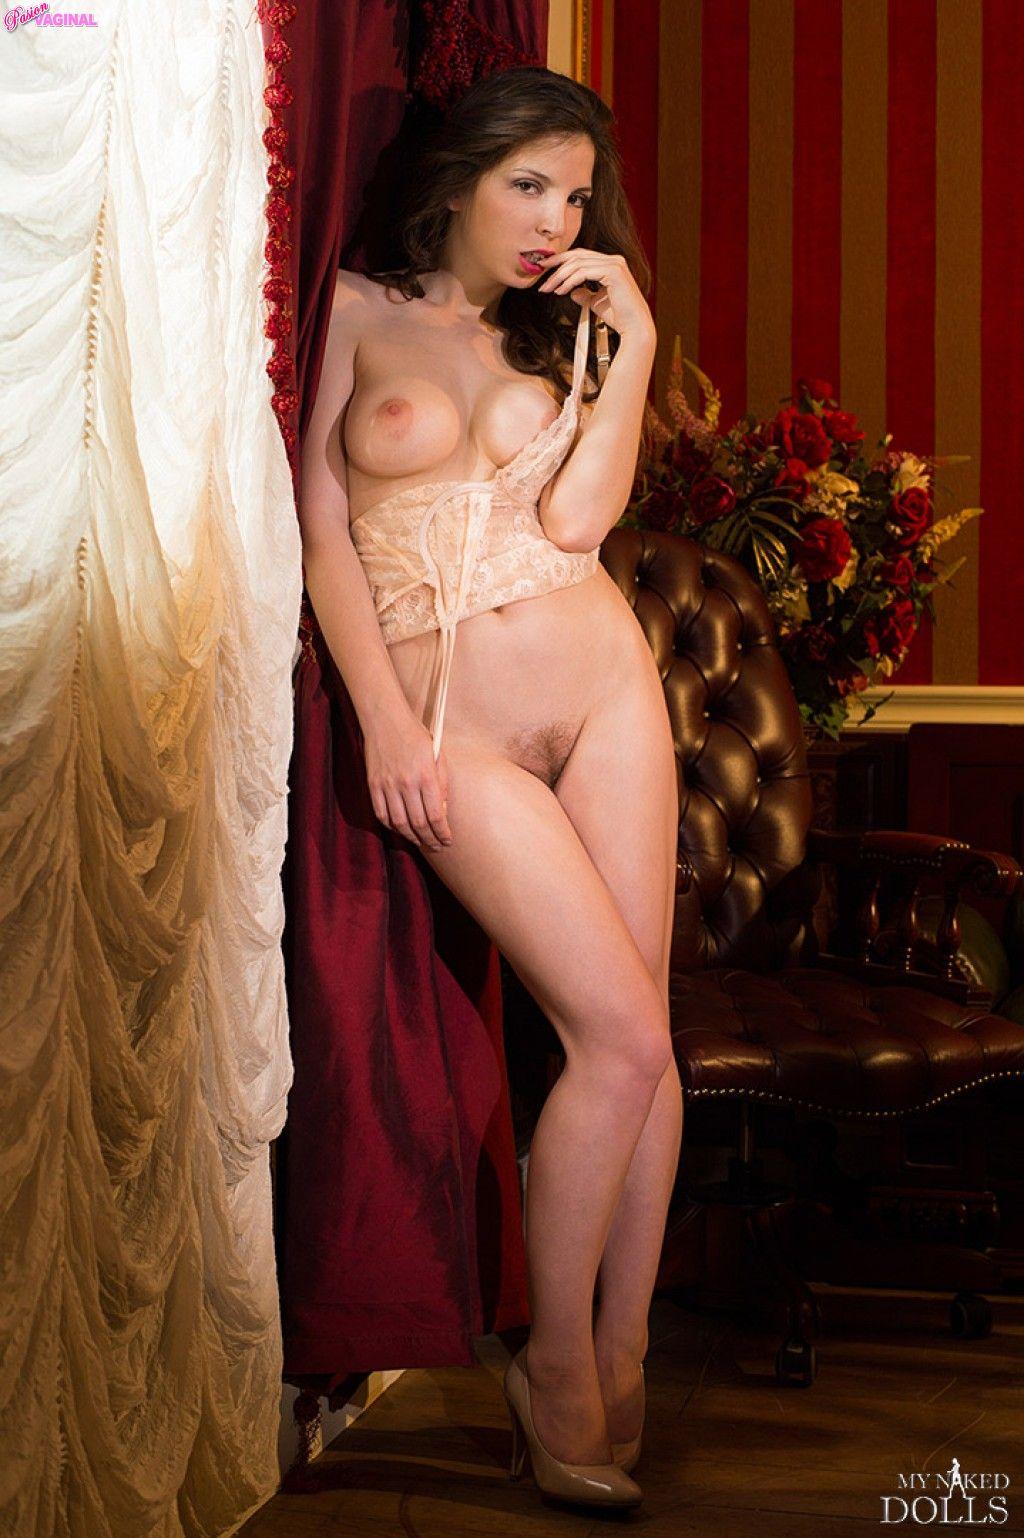 Karina-Avakyan-como-Miranda-Malena-en-My-Naked-Dolls-38